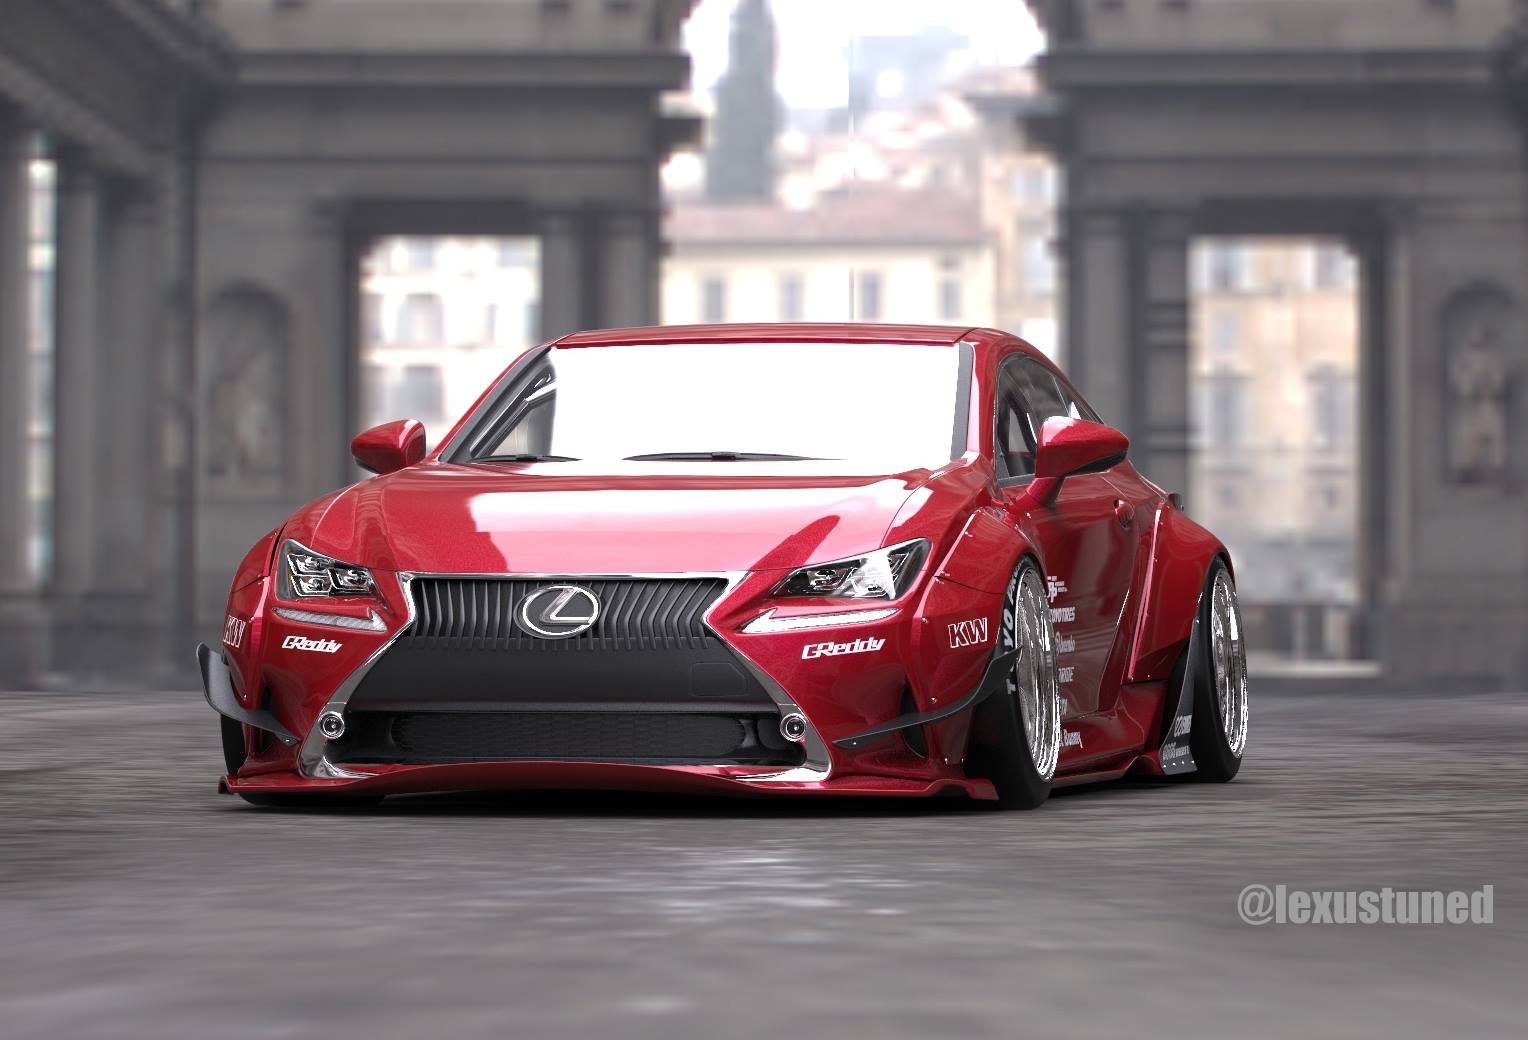 Rocket Bunny Lexus Rc Readying For 2014 Sema Autoevolution